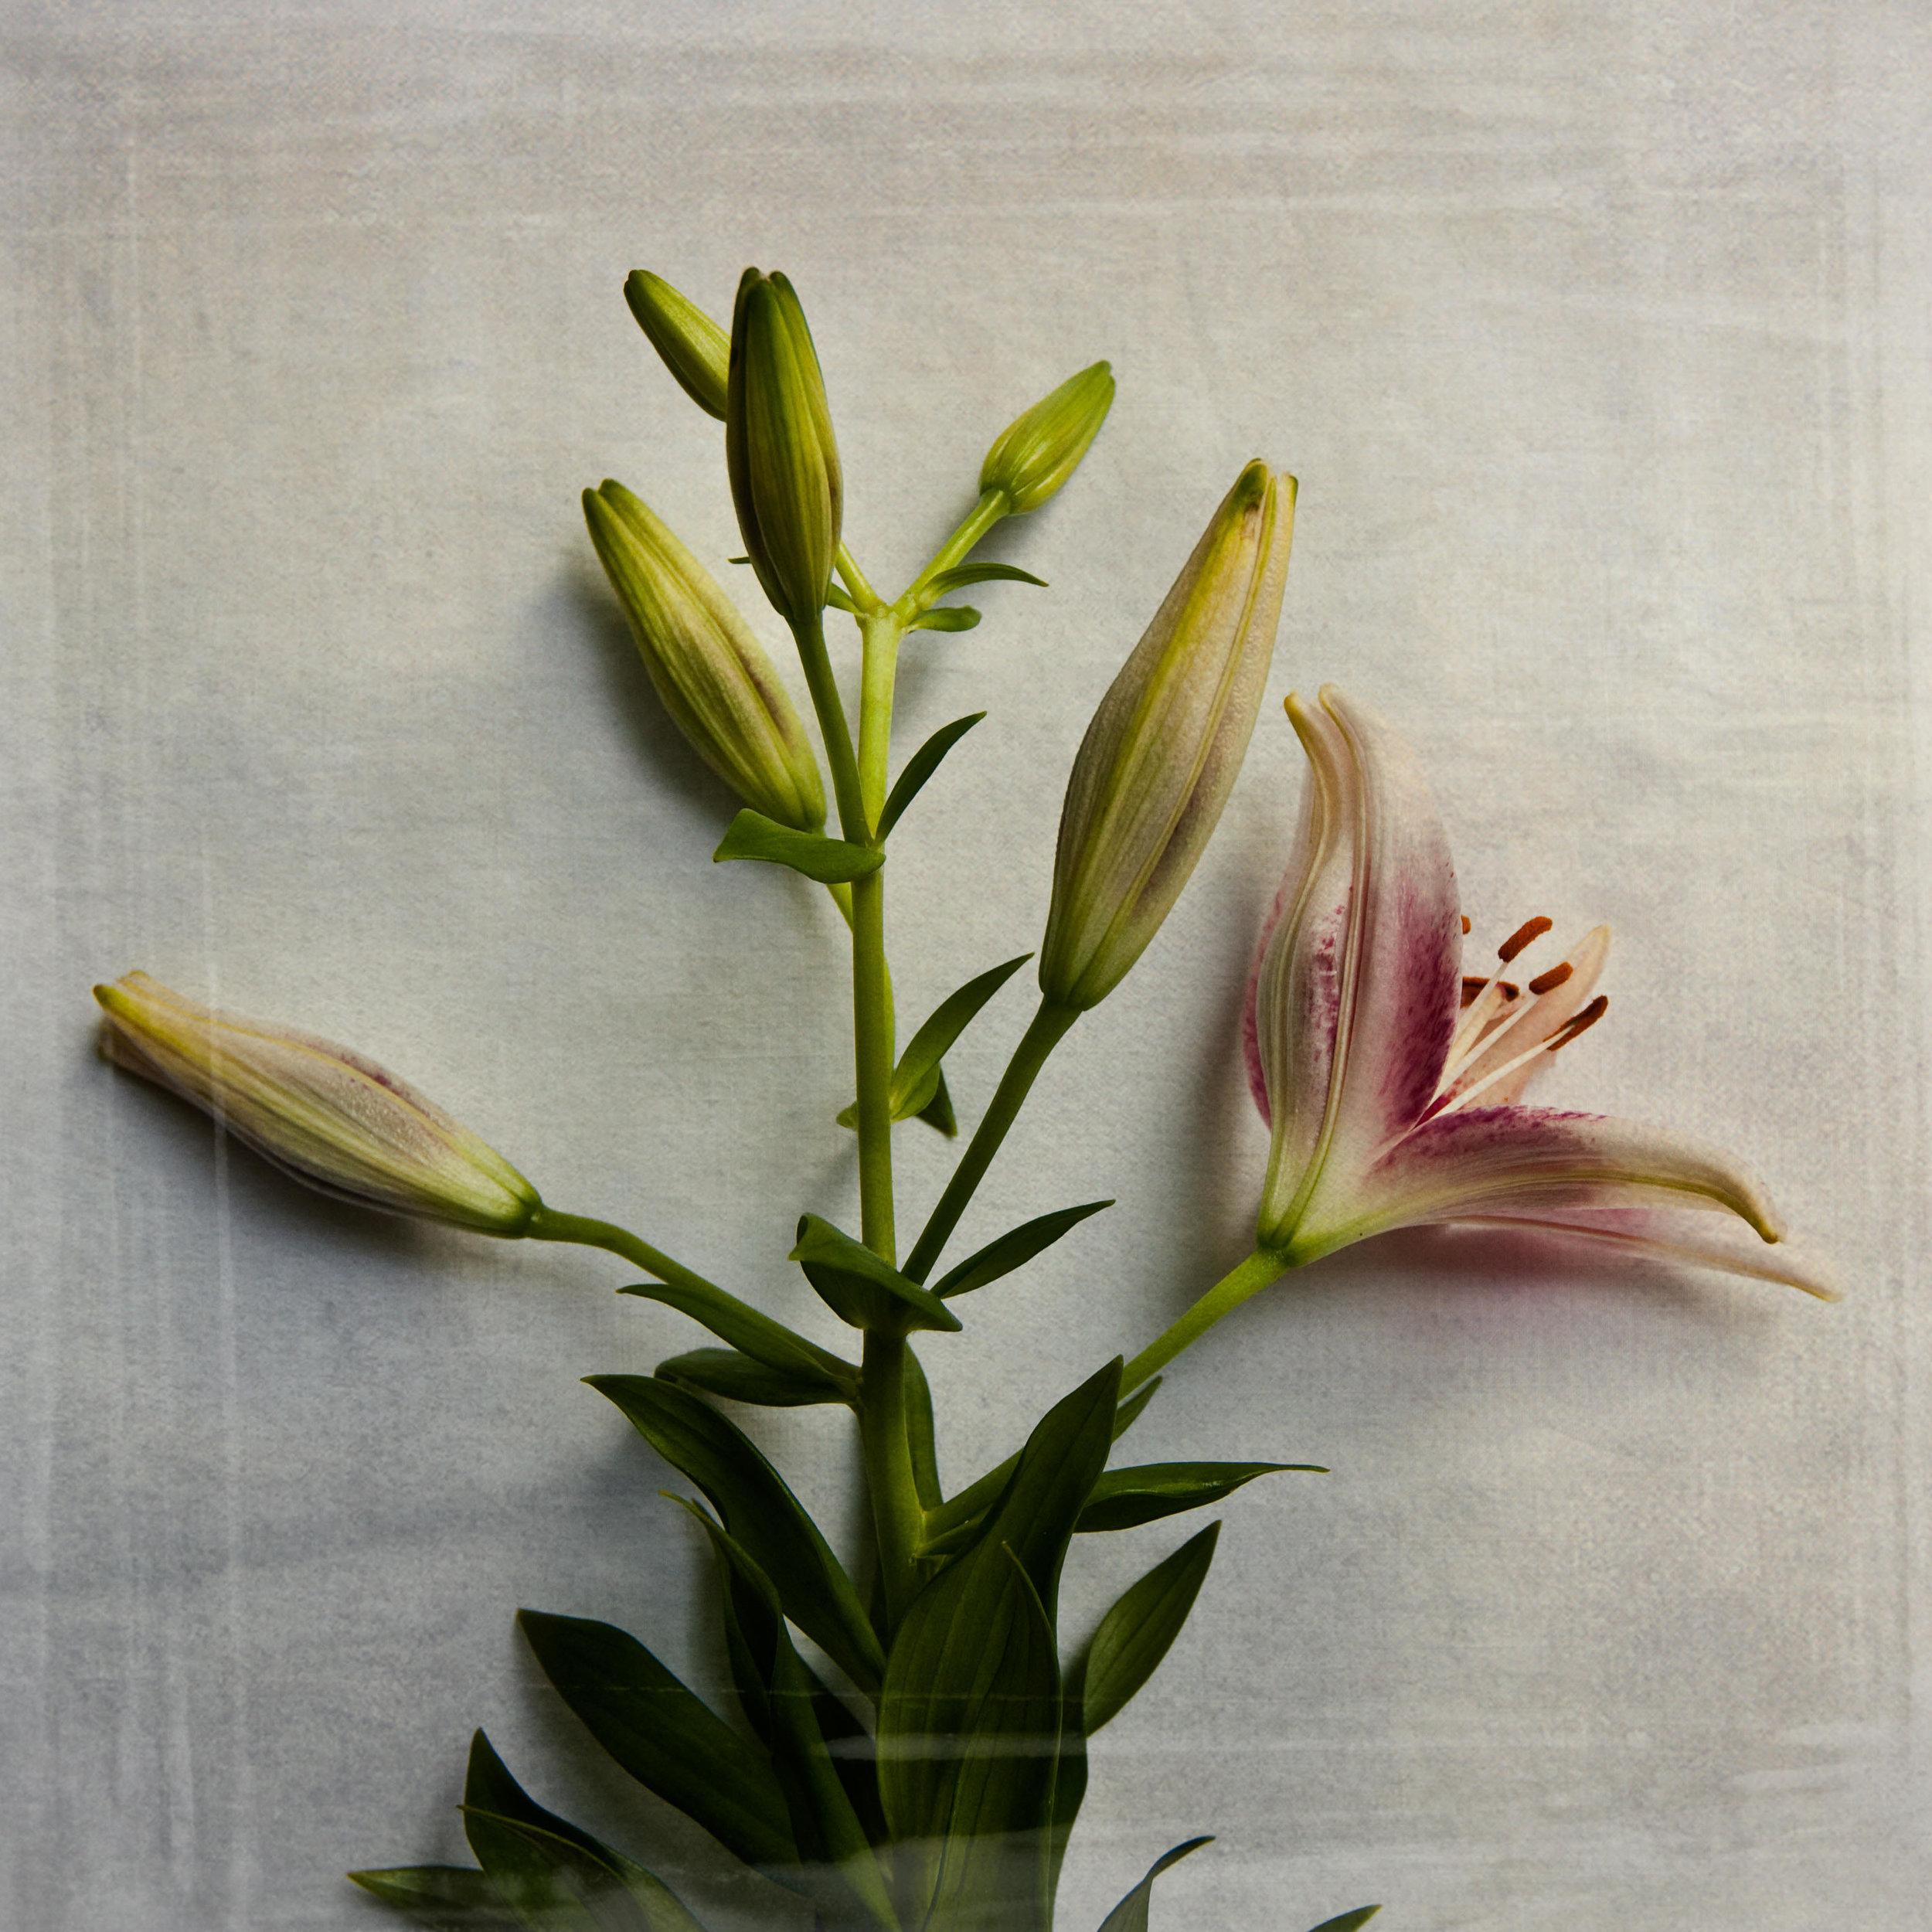 lily-7761.jpg